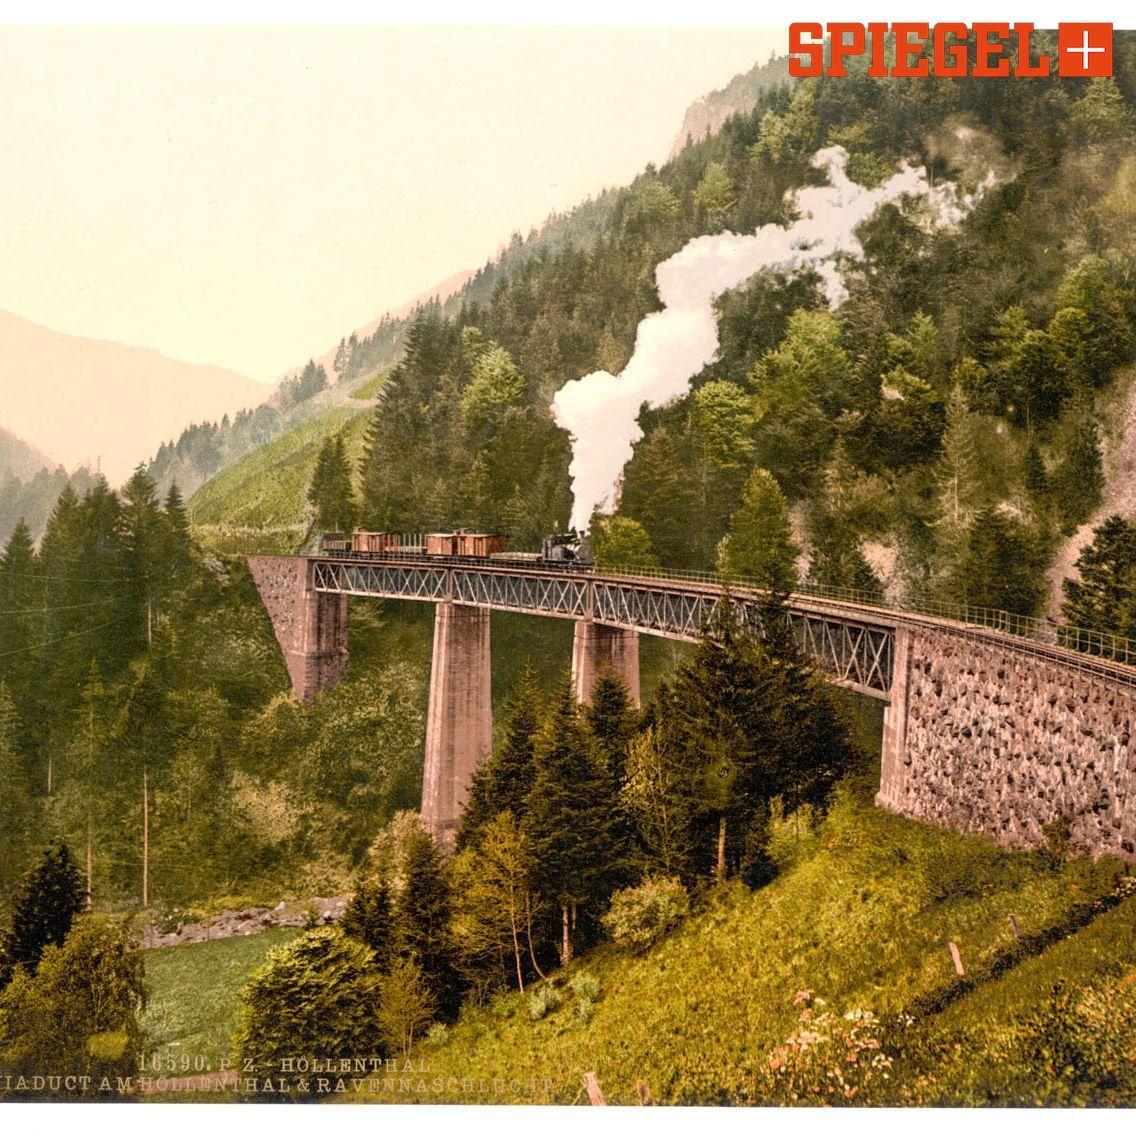 August Borsig: König der Lokomotiven https://t.co/sWxPsk1ebu